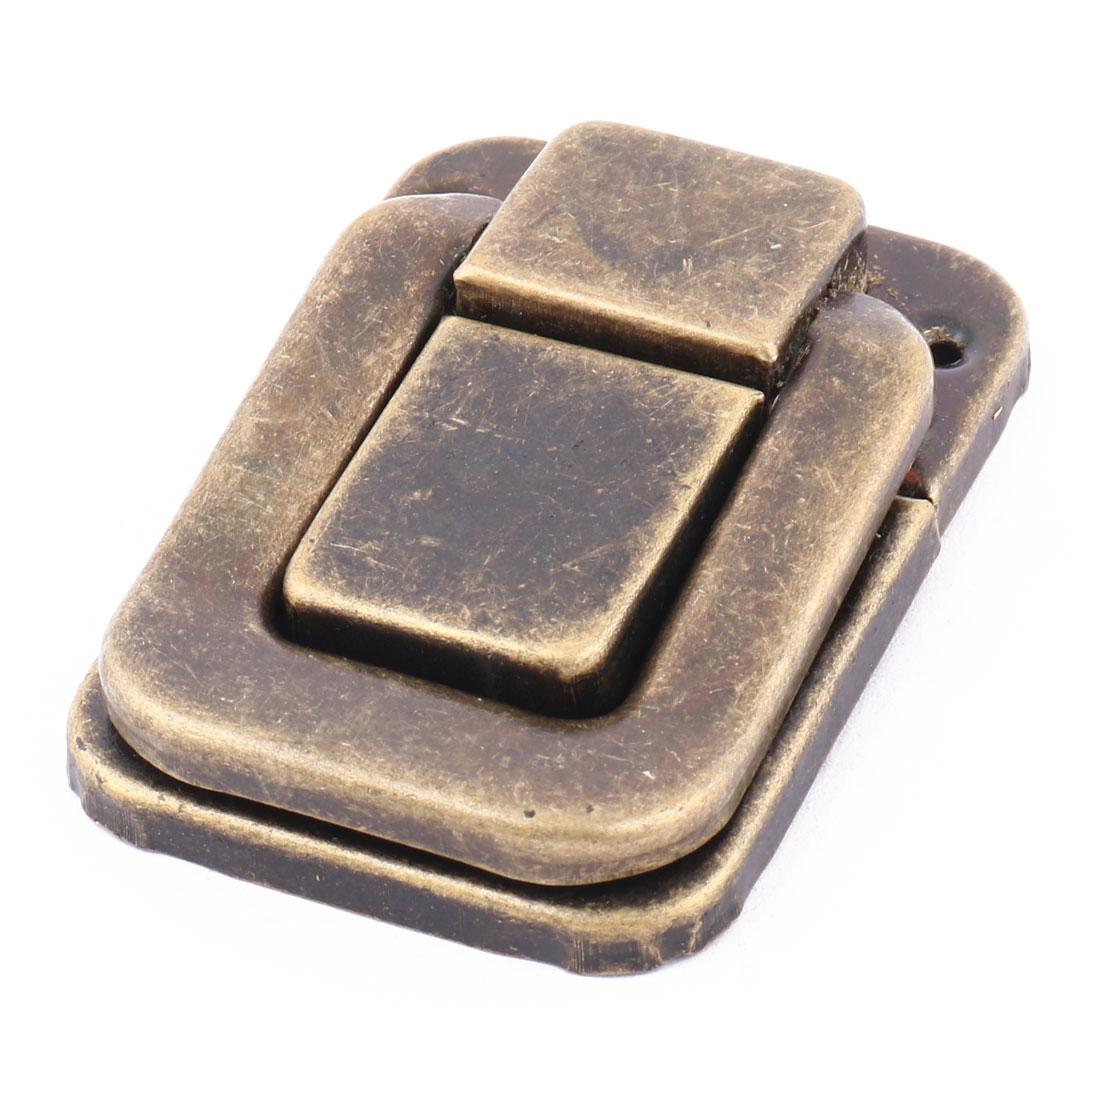 Suitcase Chest Box Lock Hook Hinge Latch Hasp w Screws Brass Tone 80mm x 55mm Set